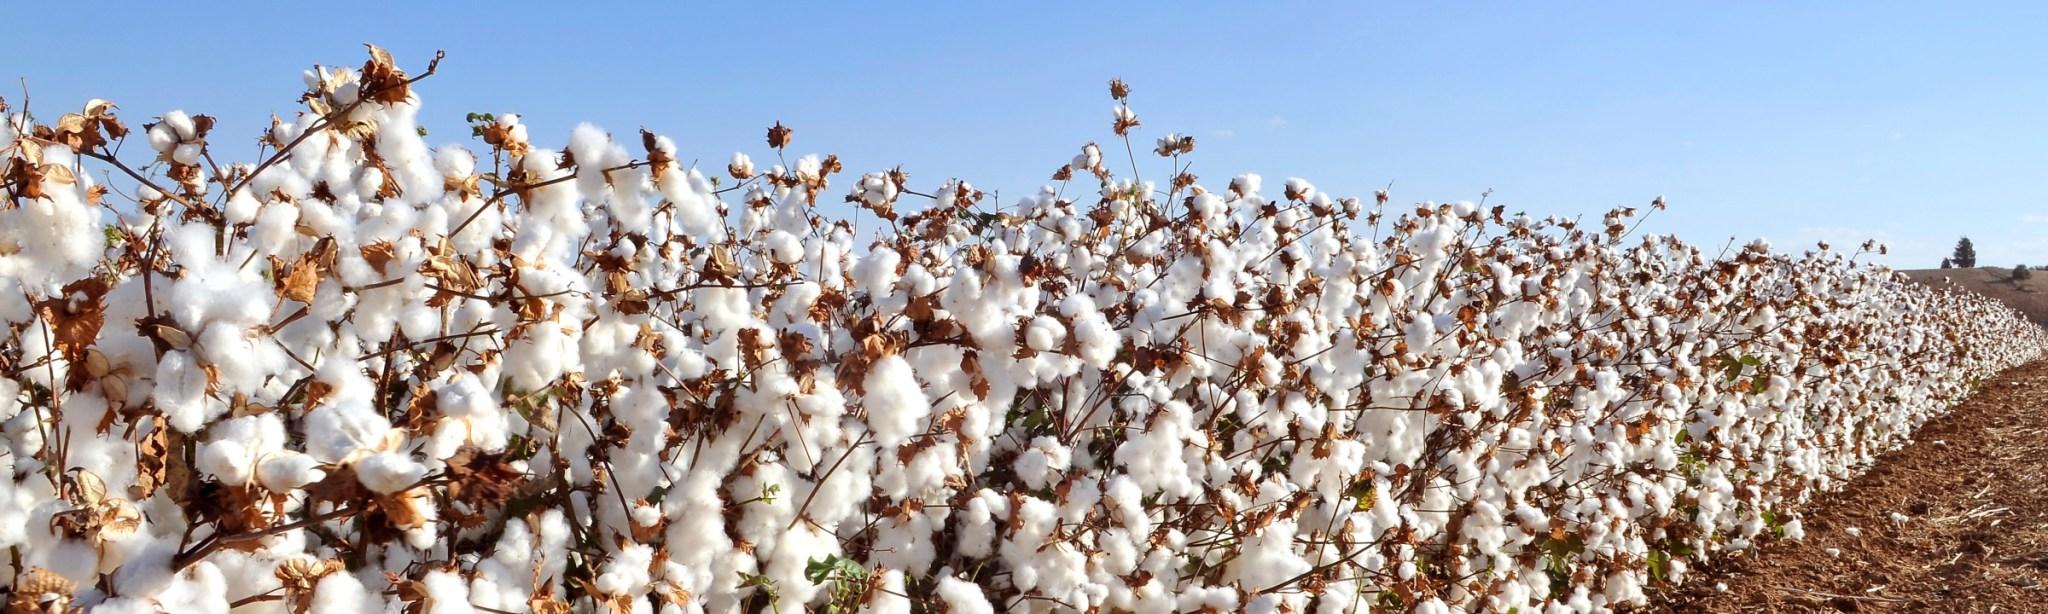 cotton2 2048x614